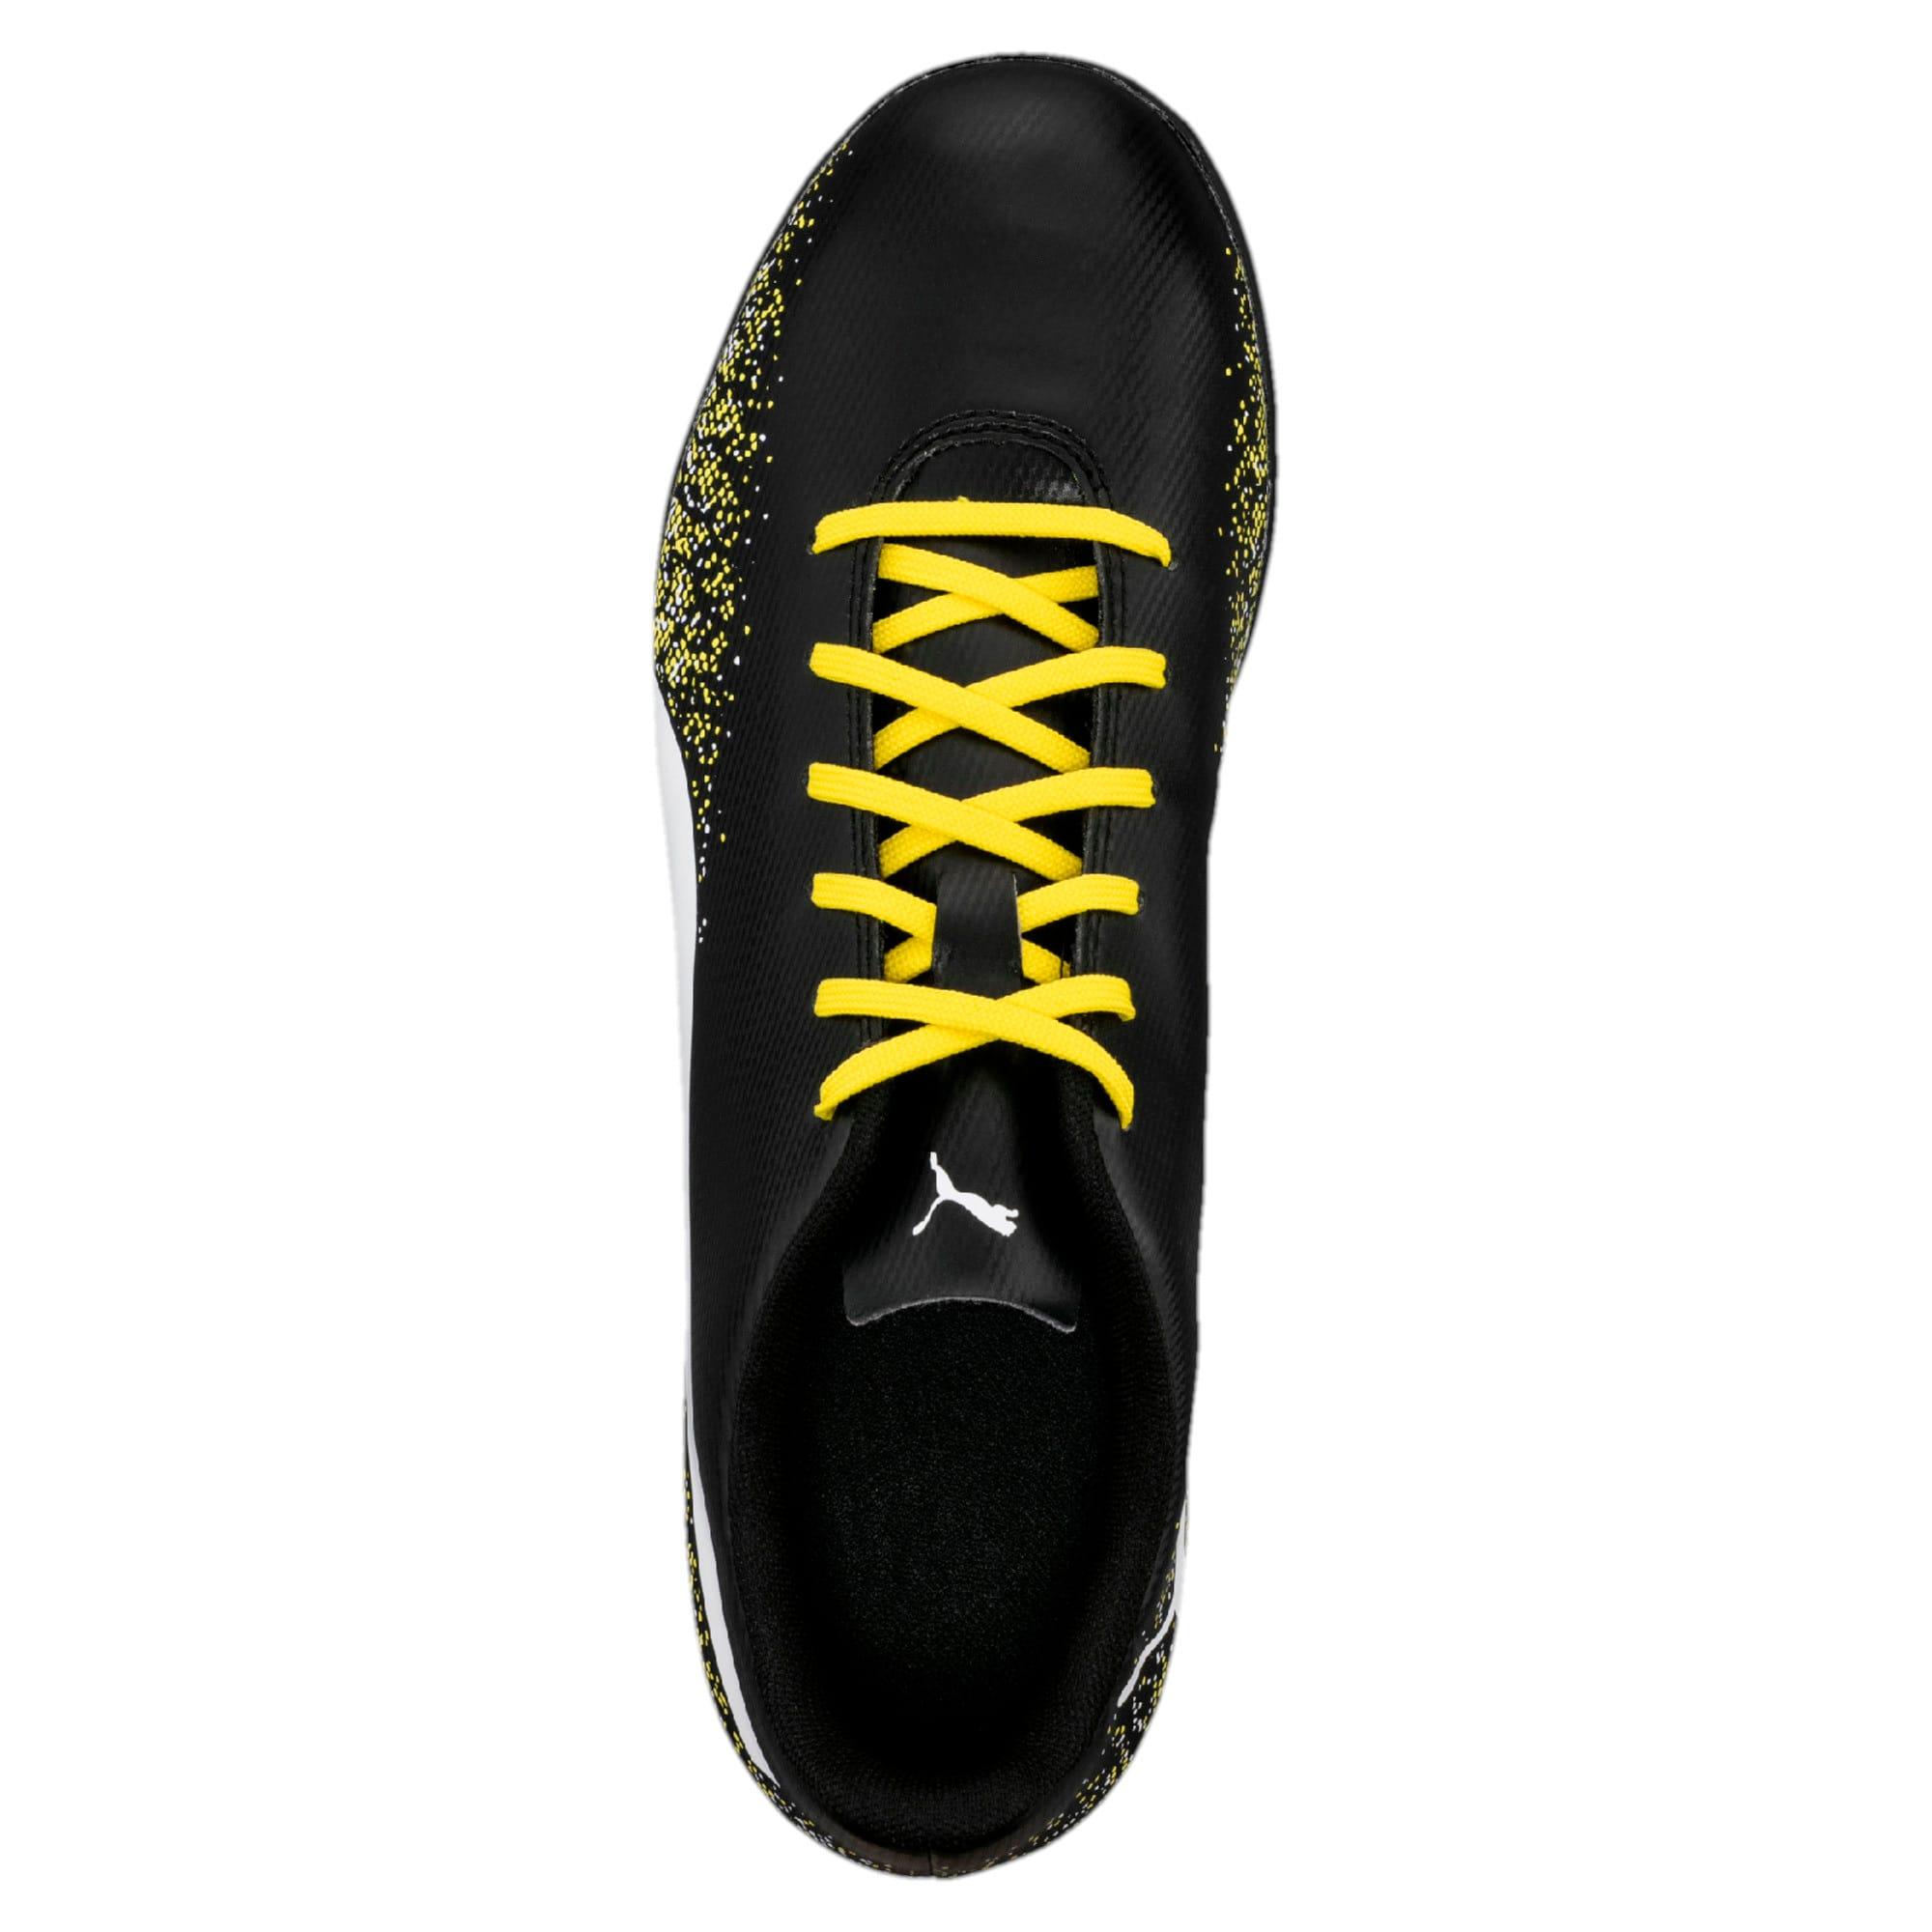 Thumbnail 3 of Truora TT Men's Football Boots, Black-White-Blazing Yellow, medium-IND